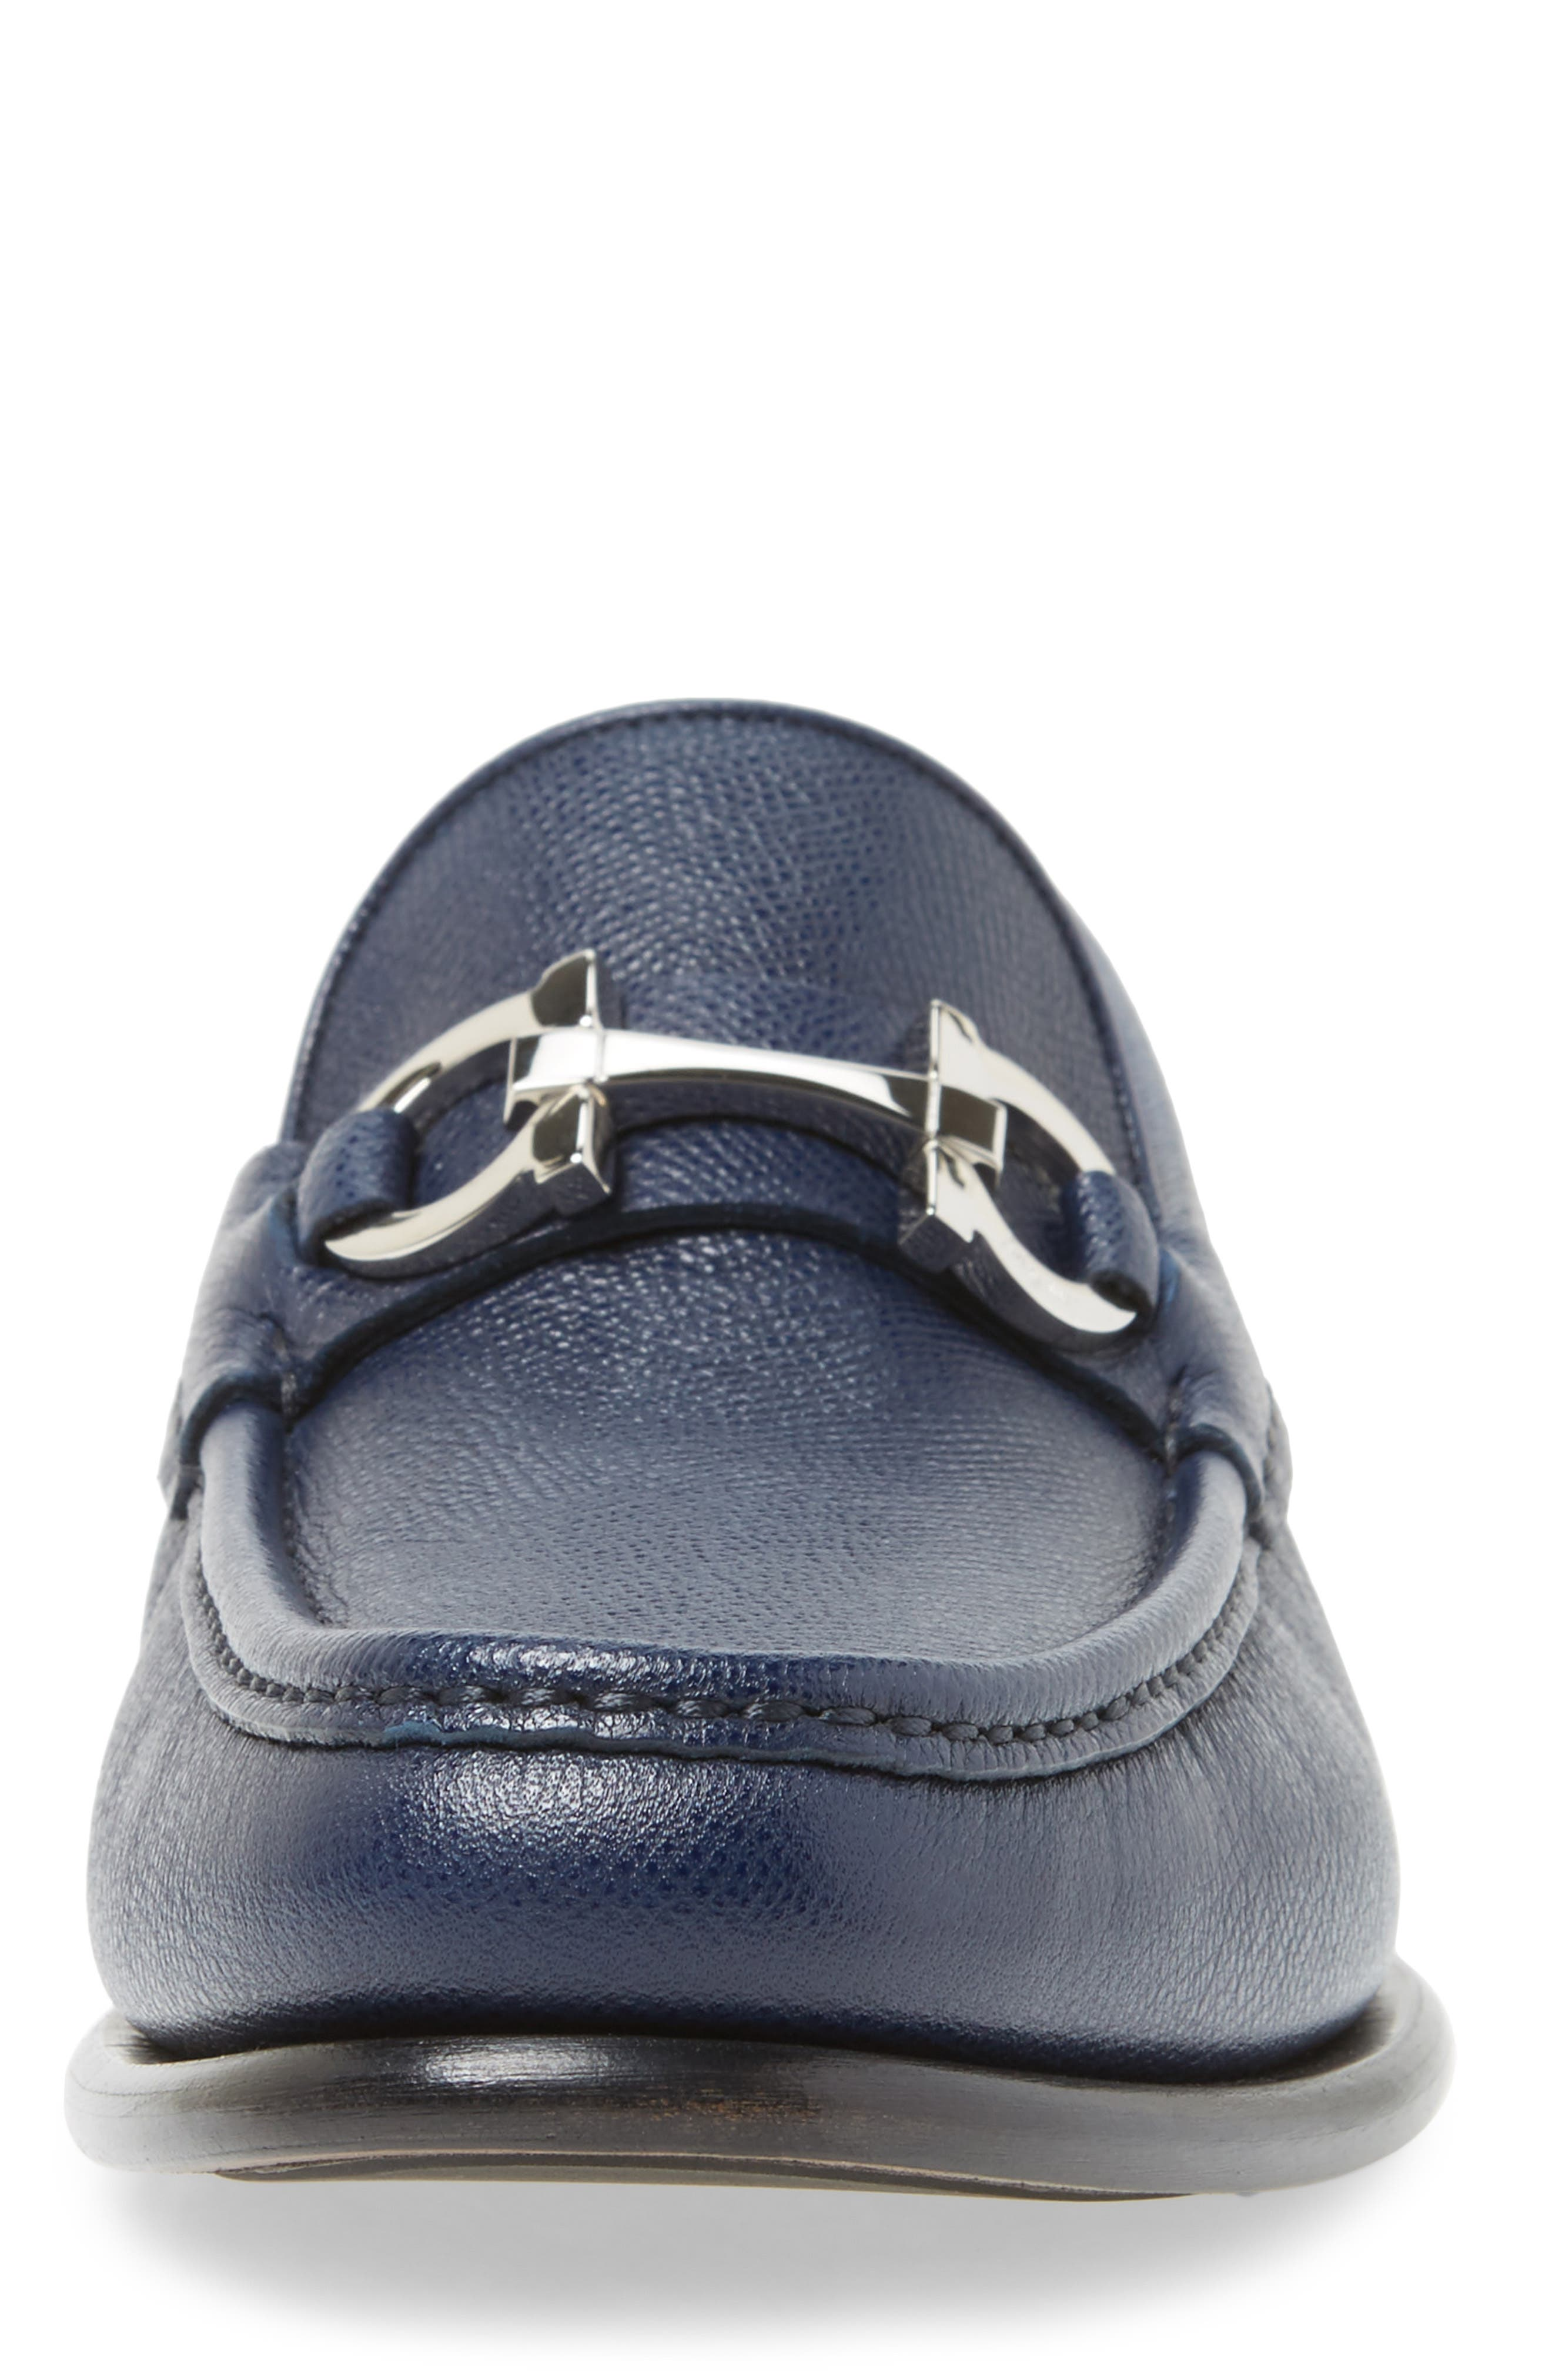 Alternate Image 4  - Salvatore Ferragamo Crown Bit Loafer (Men)